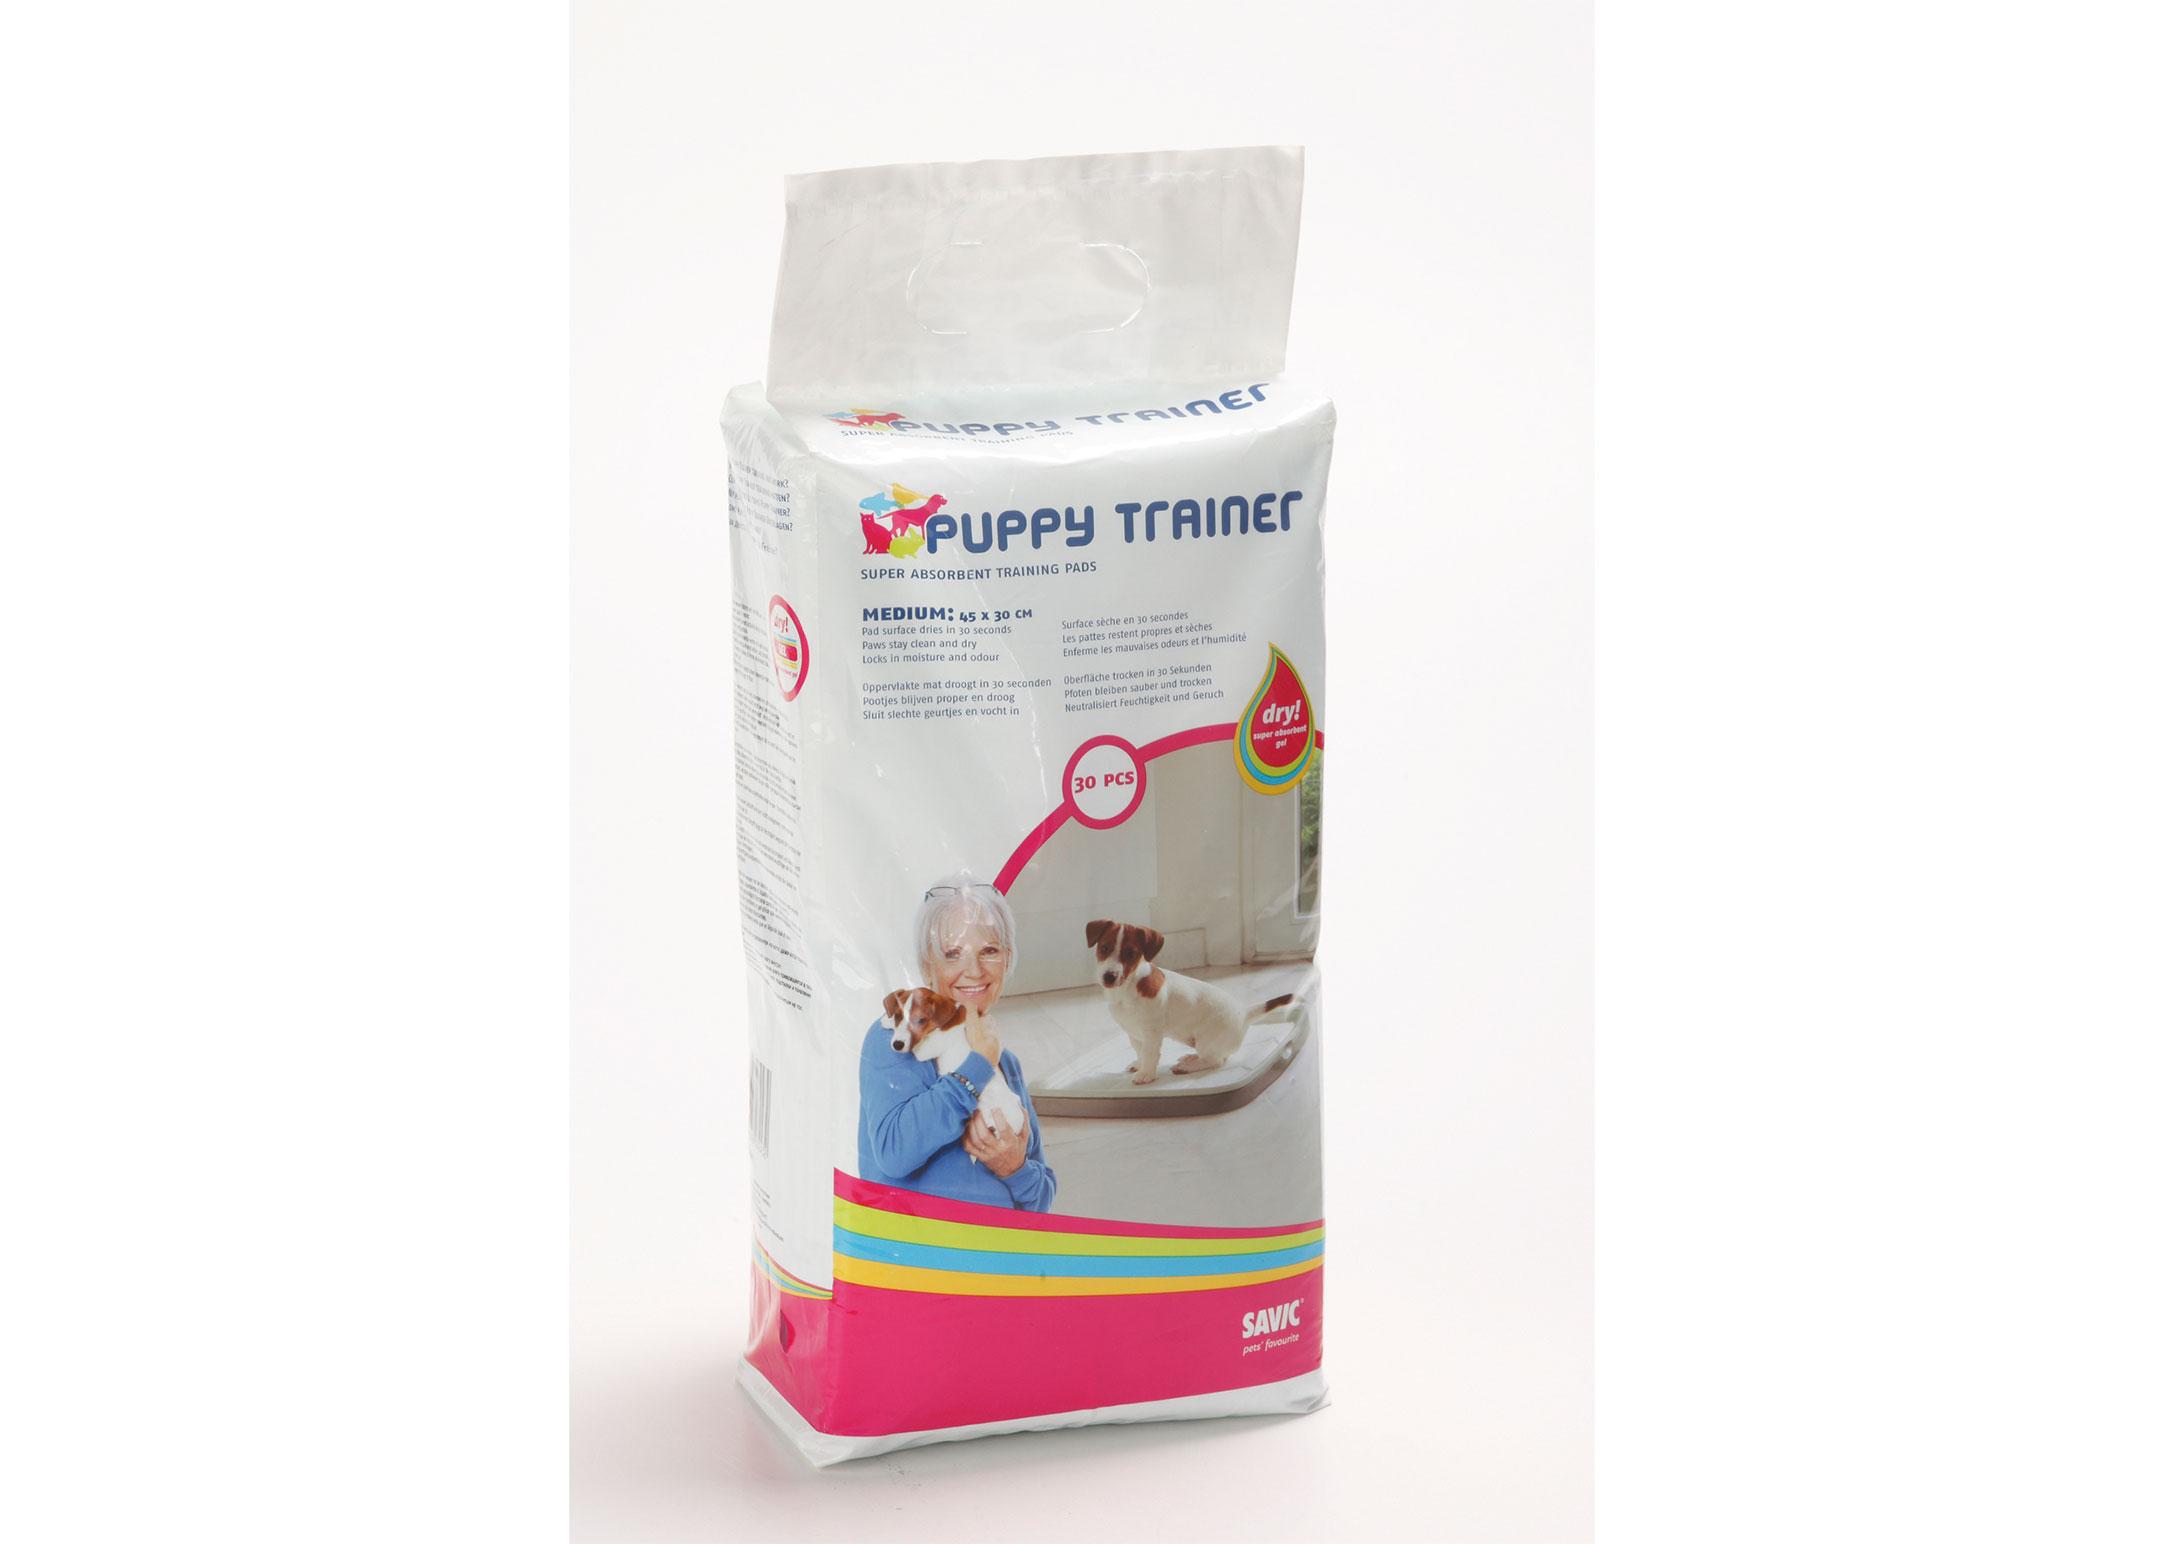 Puppylock Puppy Trainer Pads (30 pcs)